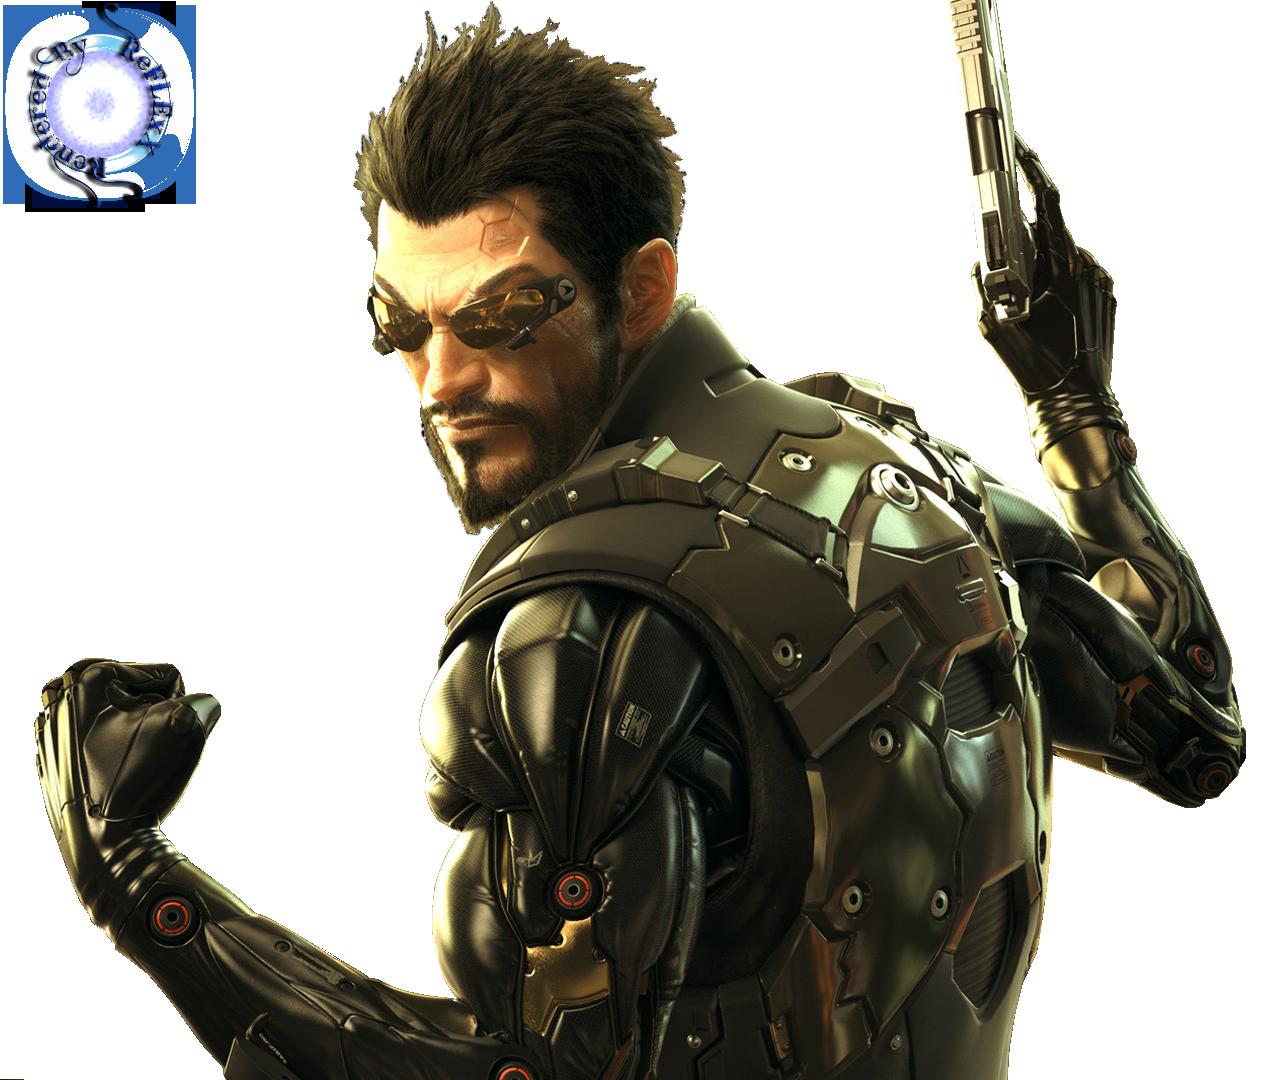 Deus Ex Free Png Image PNG Image - Deus Ex PNG